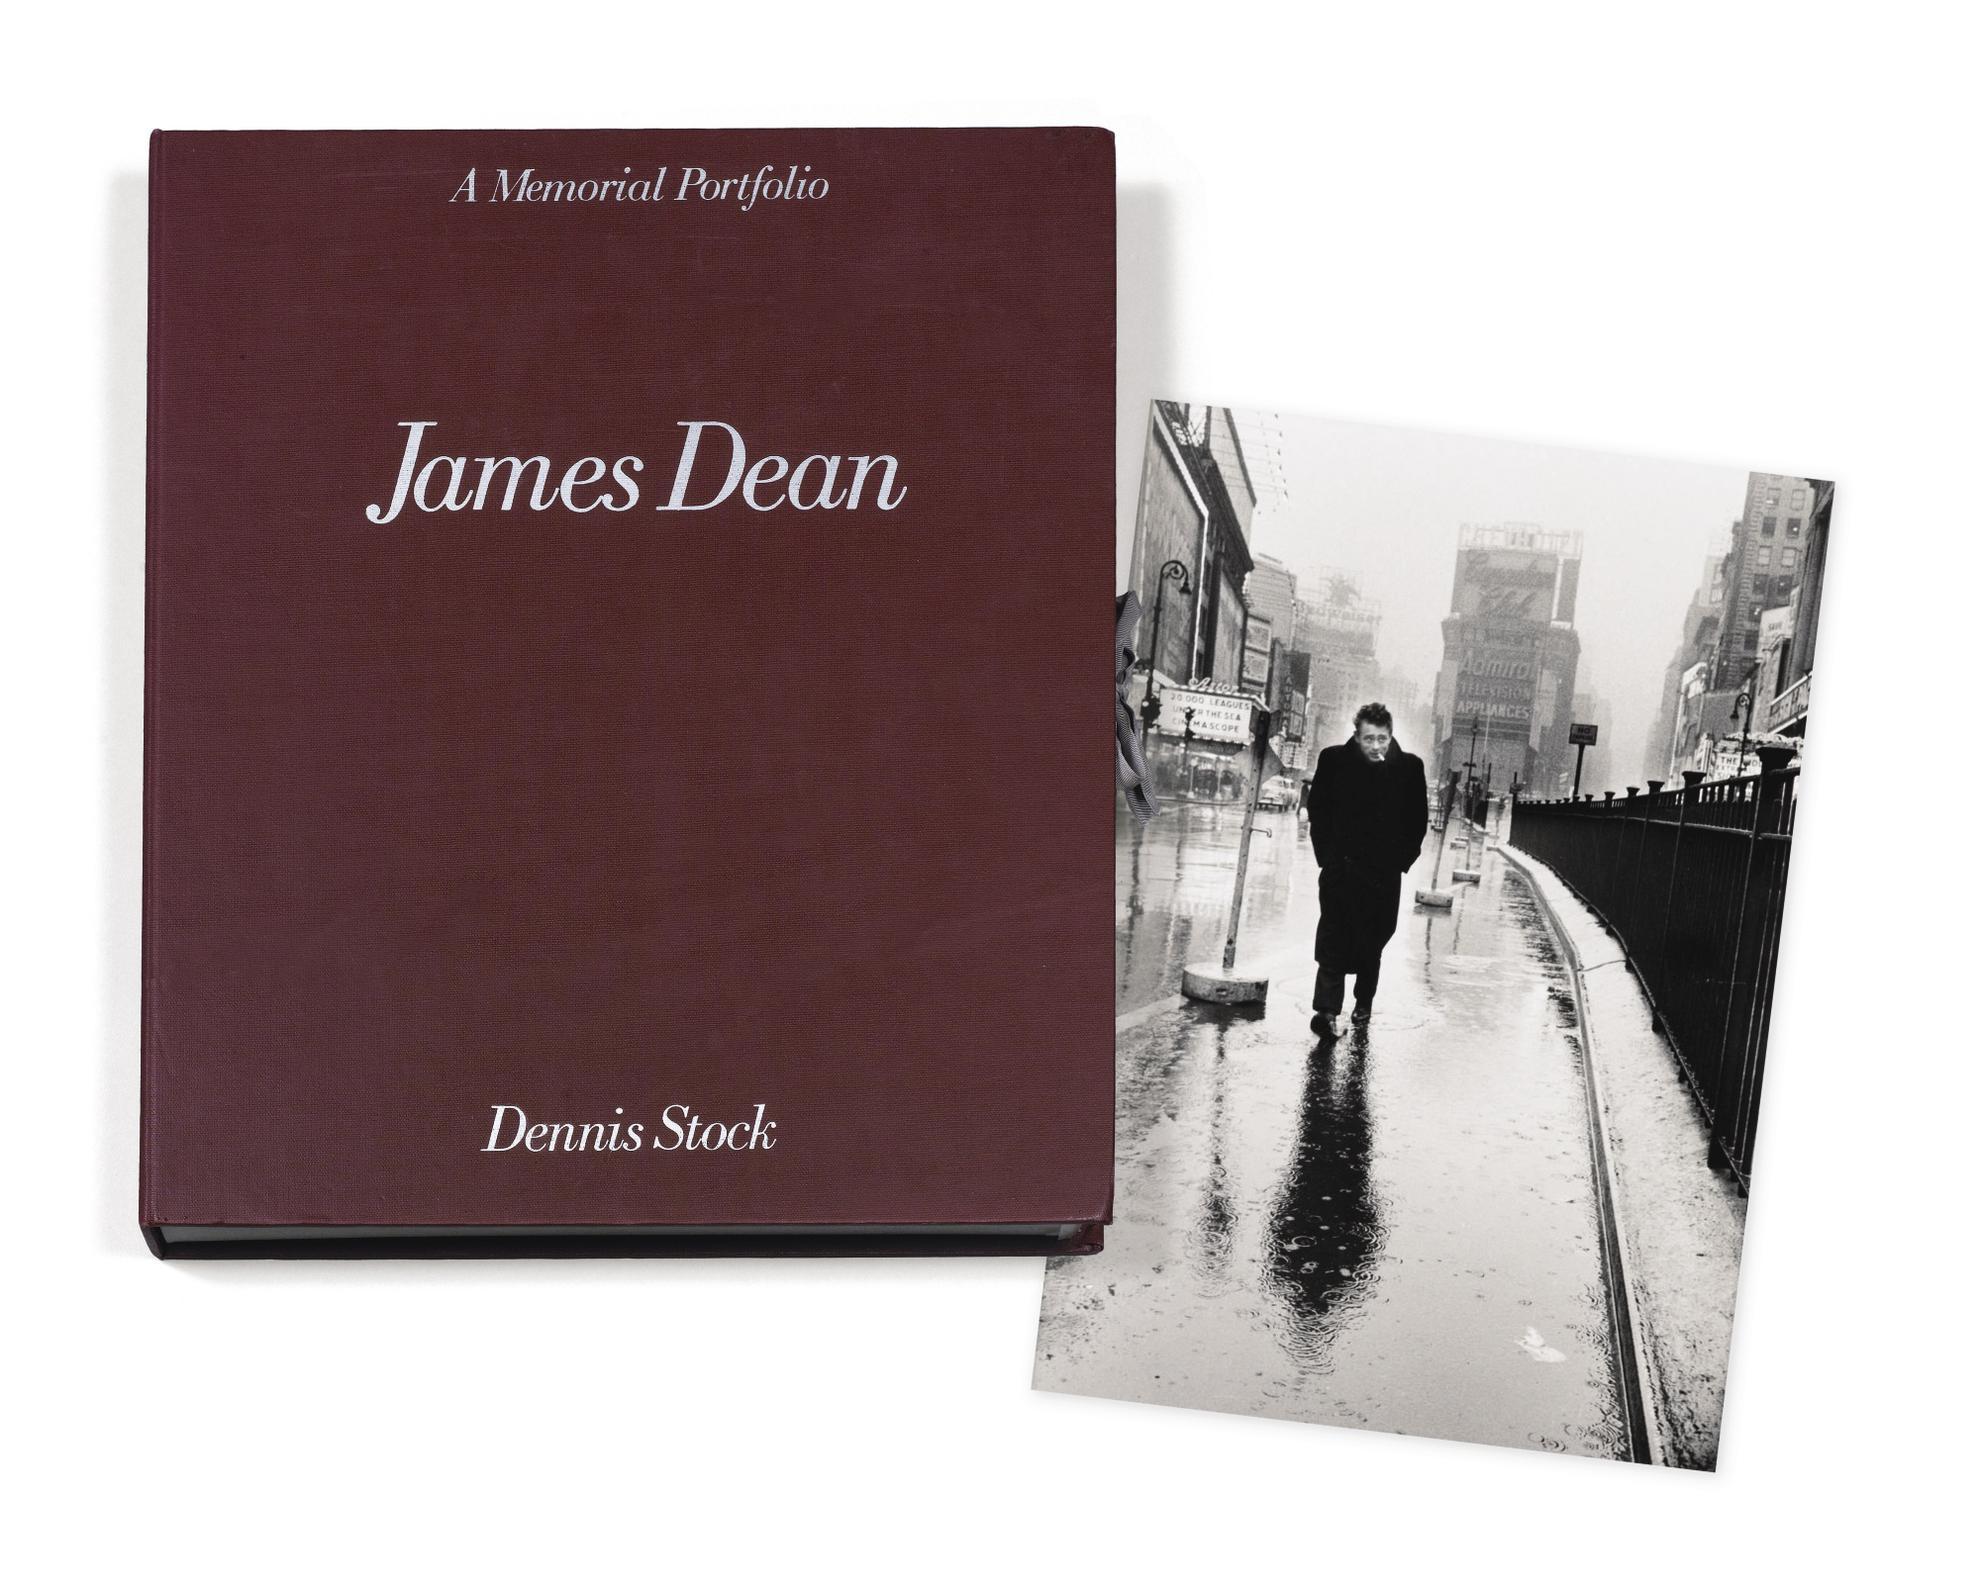 Dennis Stock-A Memorial Portfolio: James Dean-1979